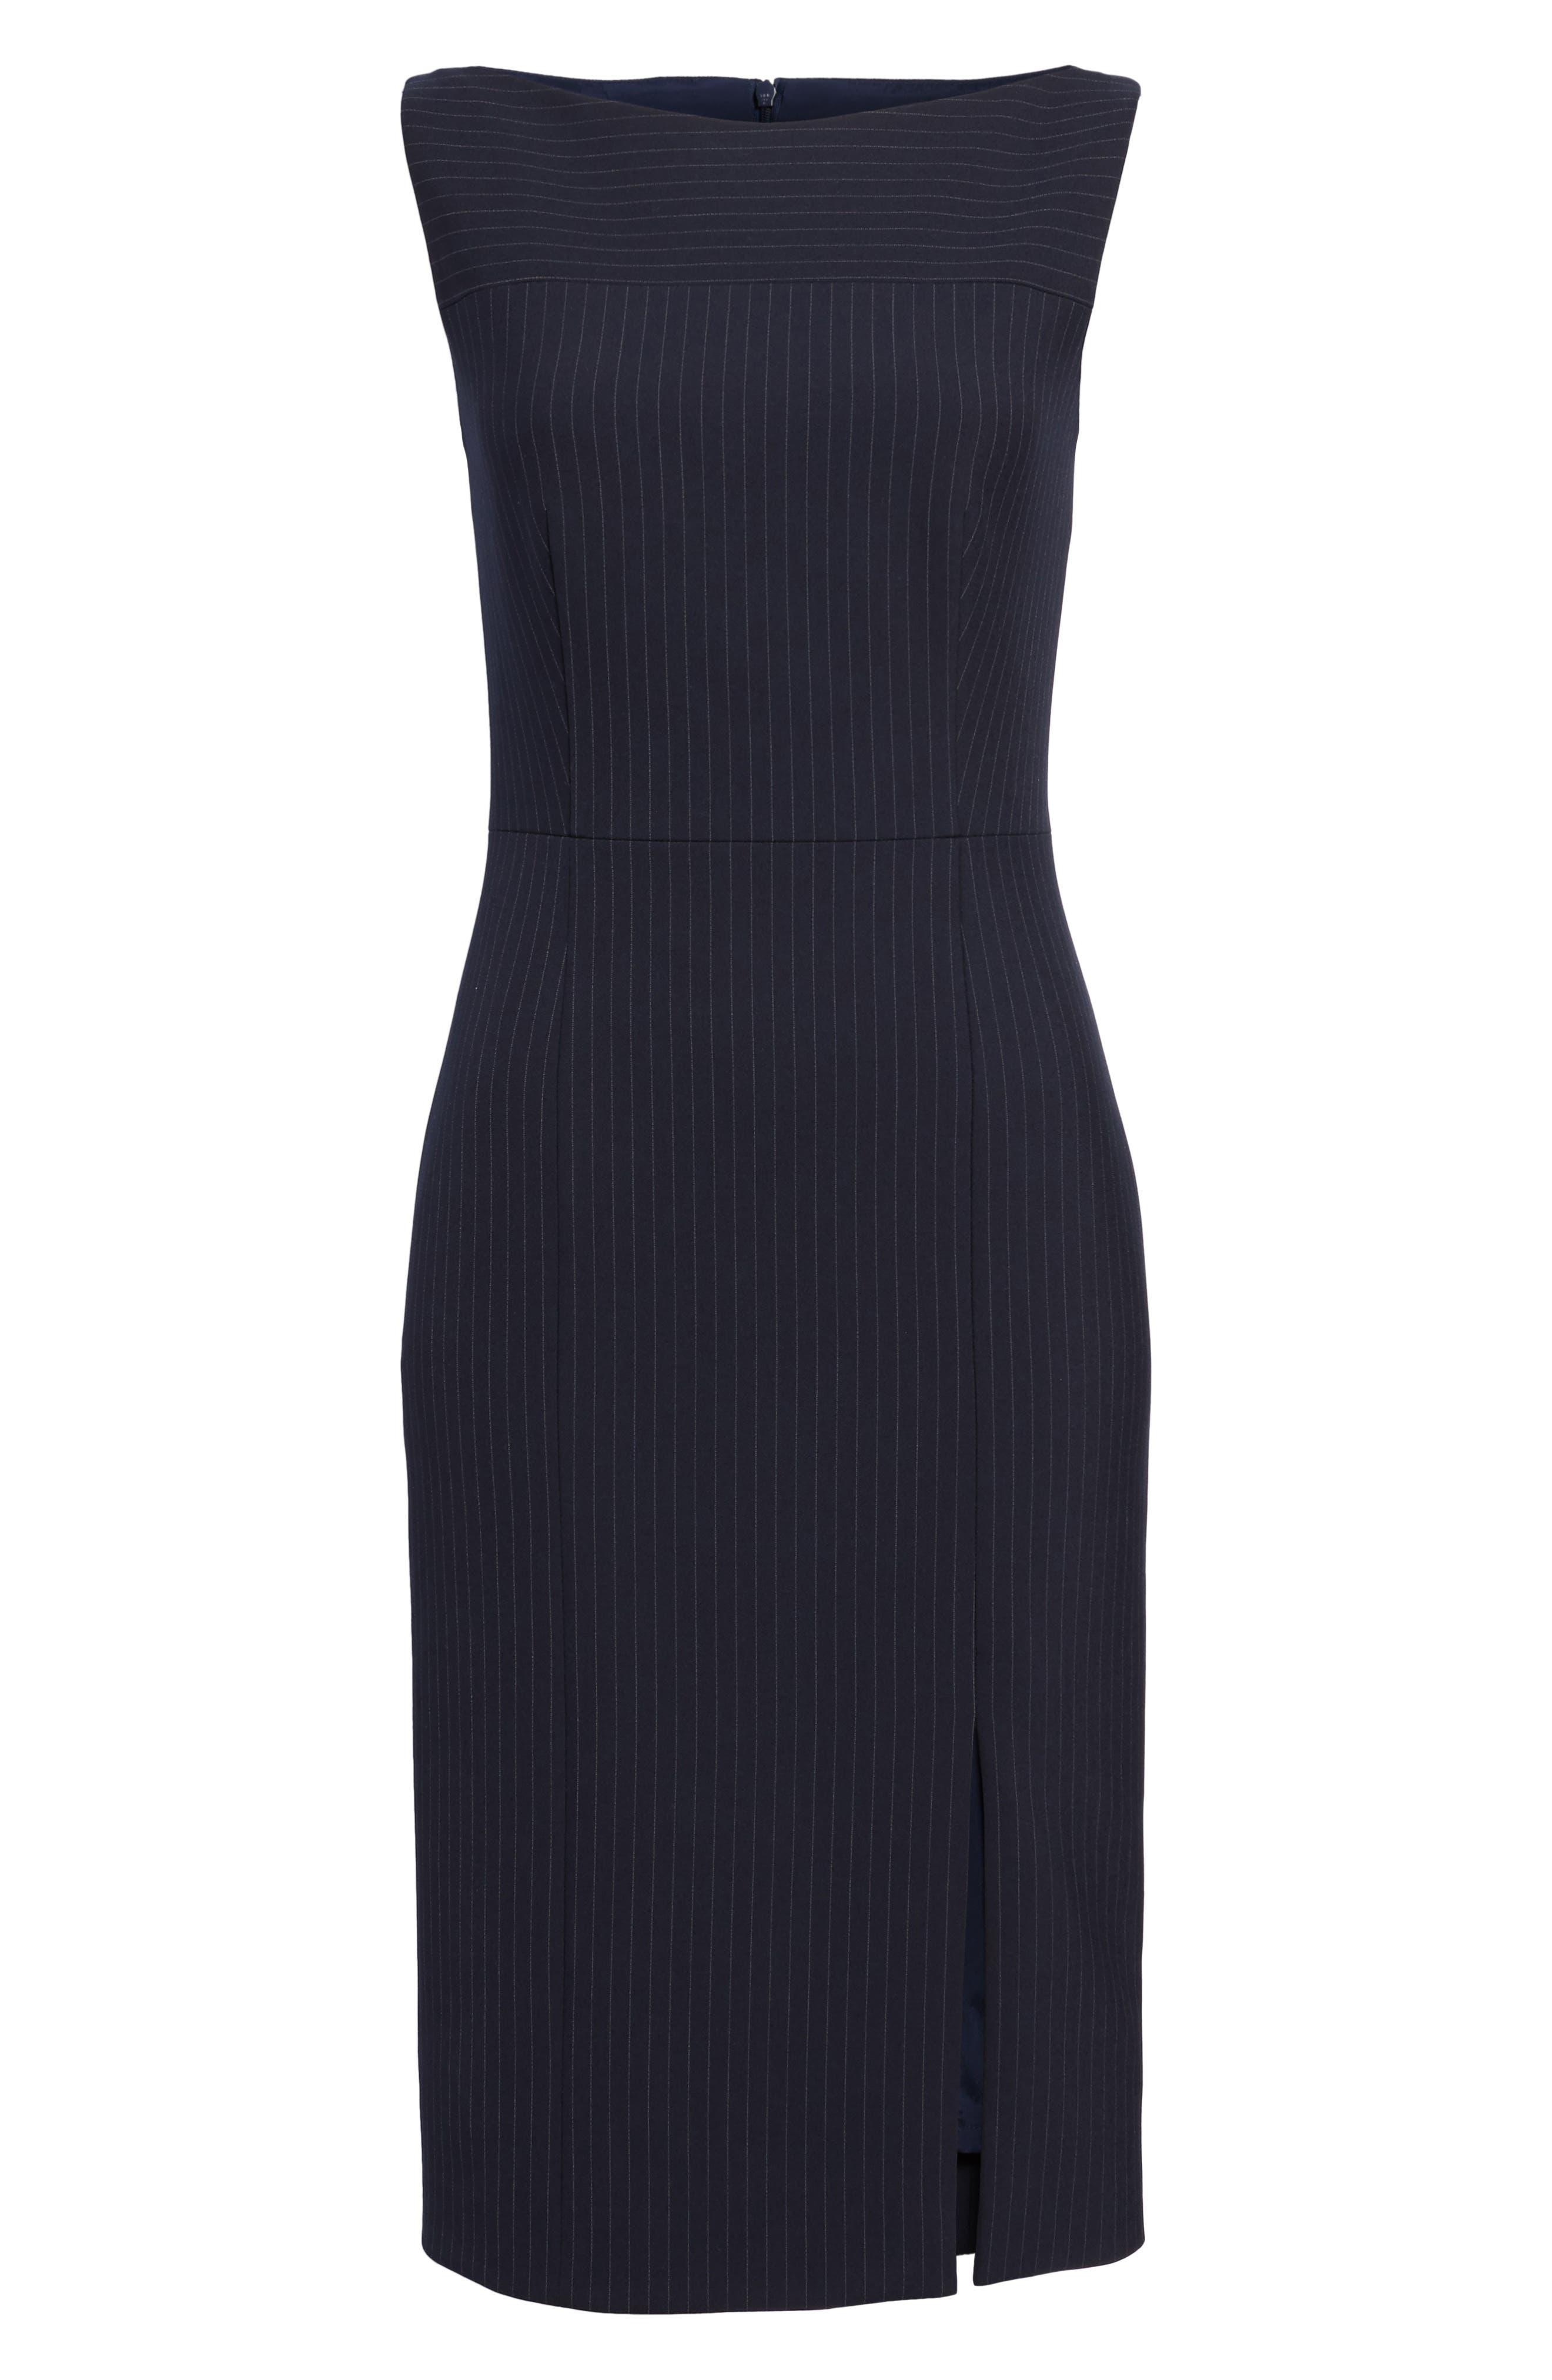 Denaka Pinstripe Sheath Dress,                             Alternate thumbnail 6, color,